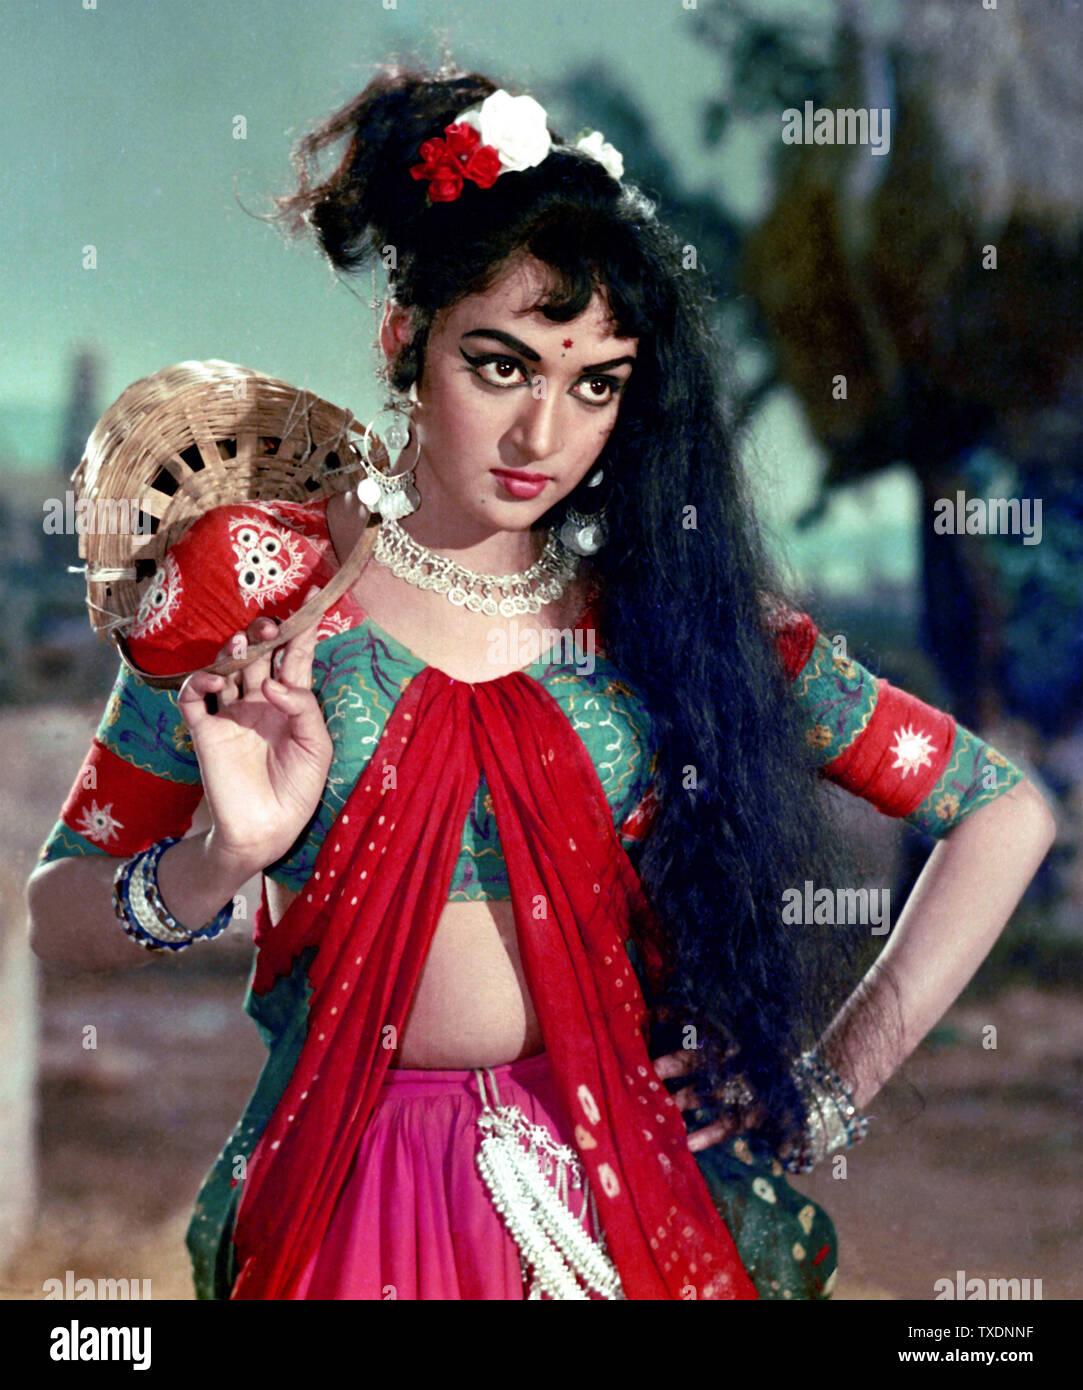 Indian Bollywood Actress Hema Malini India Asia 1968 Stock Photo Alamy